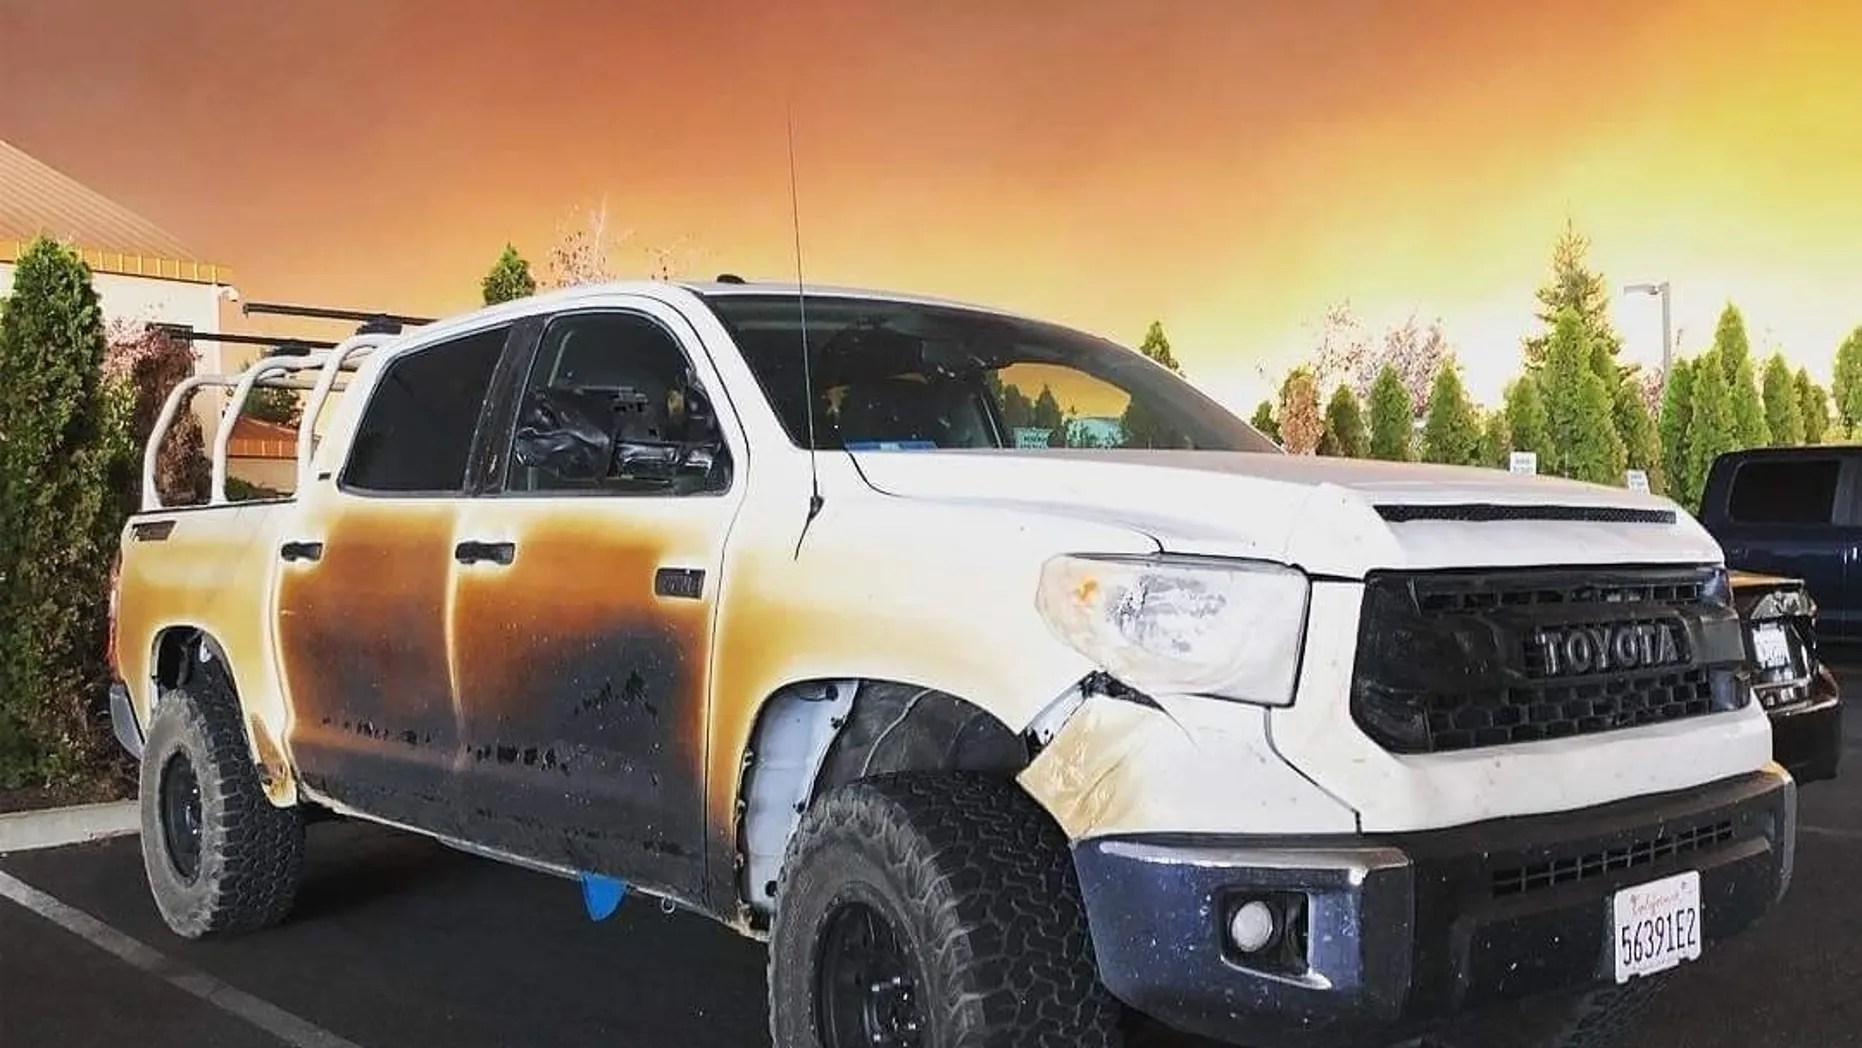 Hero California nurse gets new truck after vehicle damaged